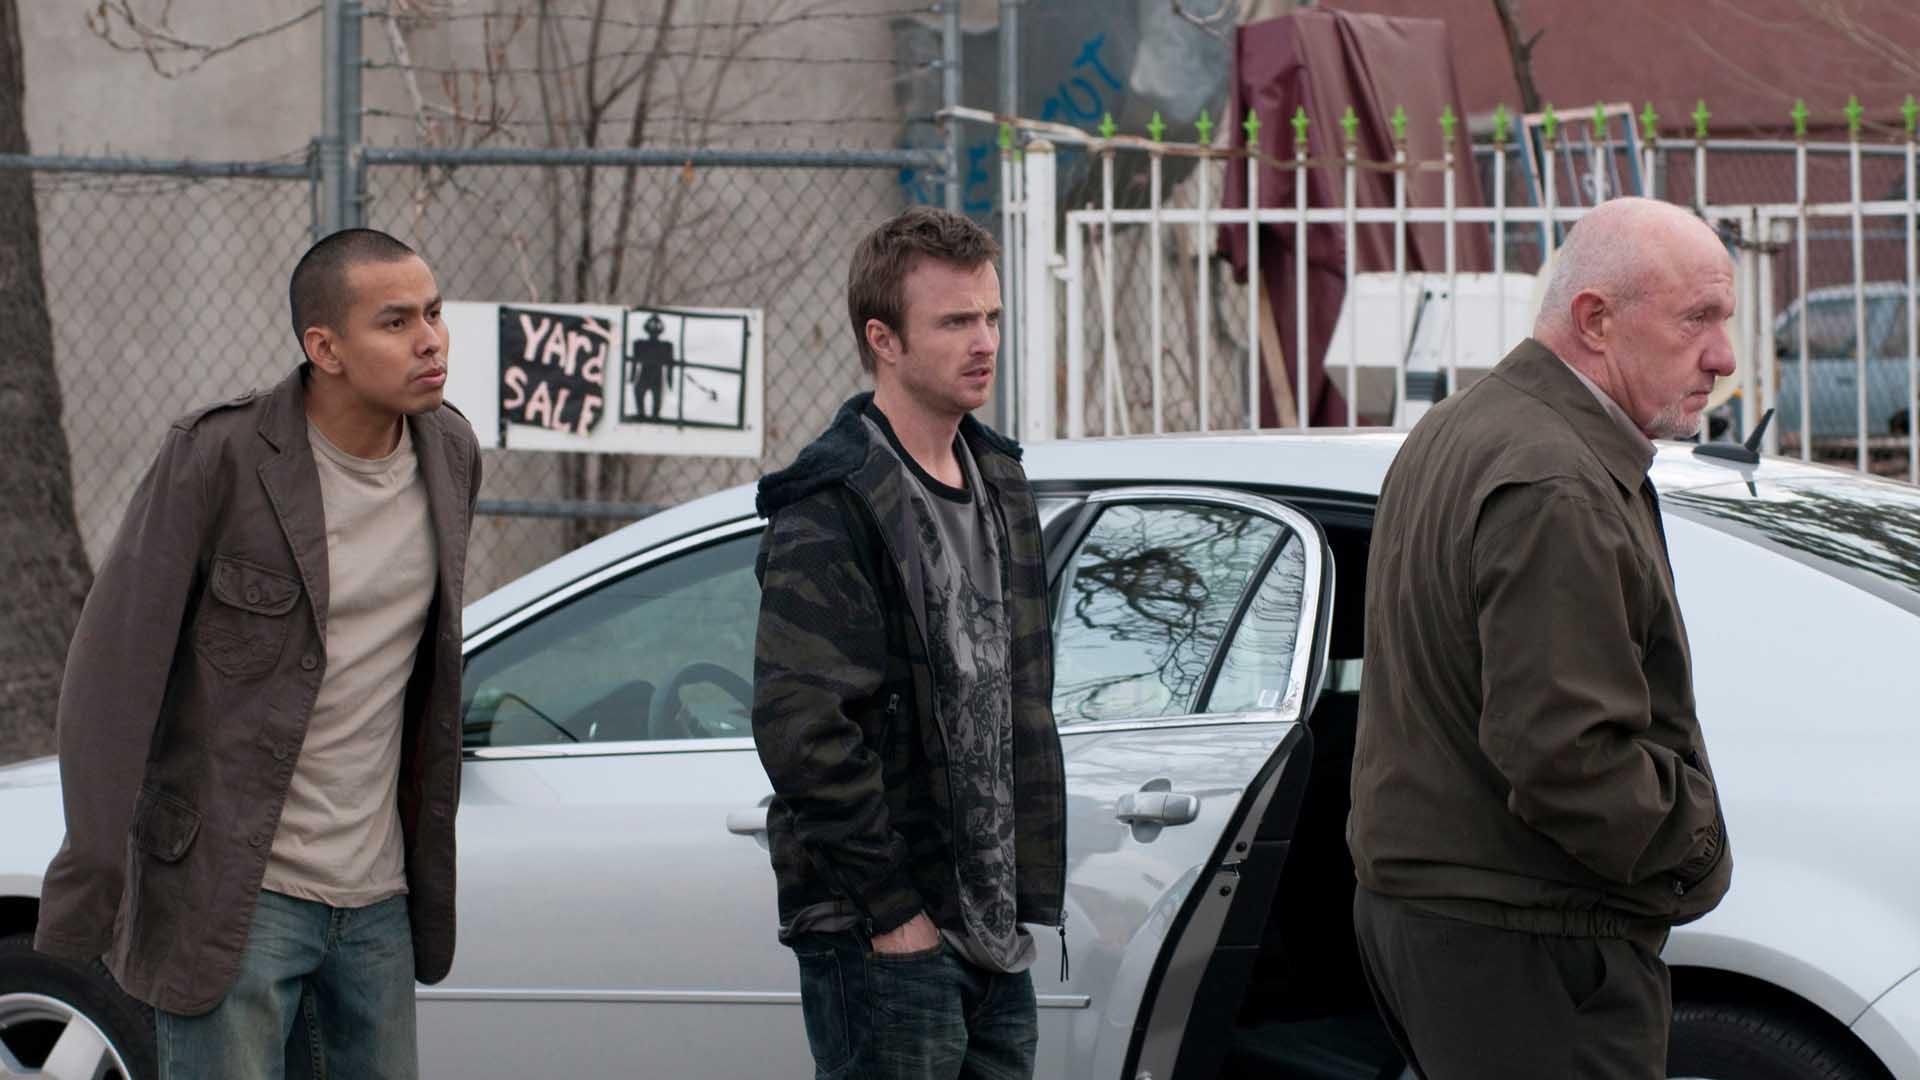 Breaking Bad Season 1-5 Complete - All Episodes | Best TV ...